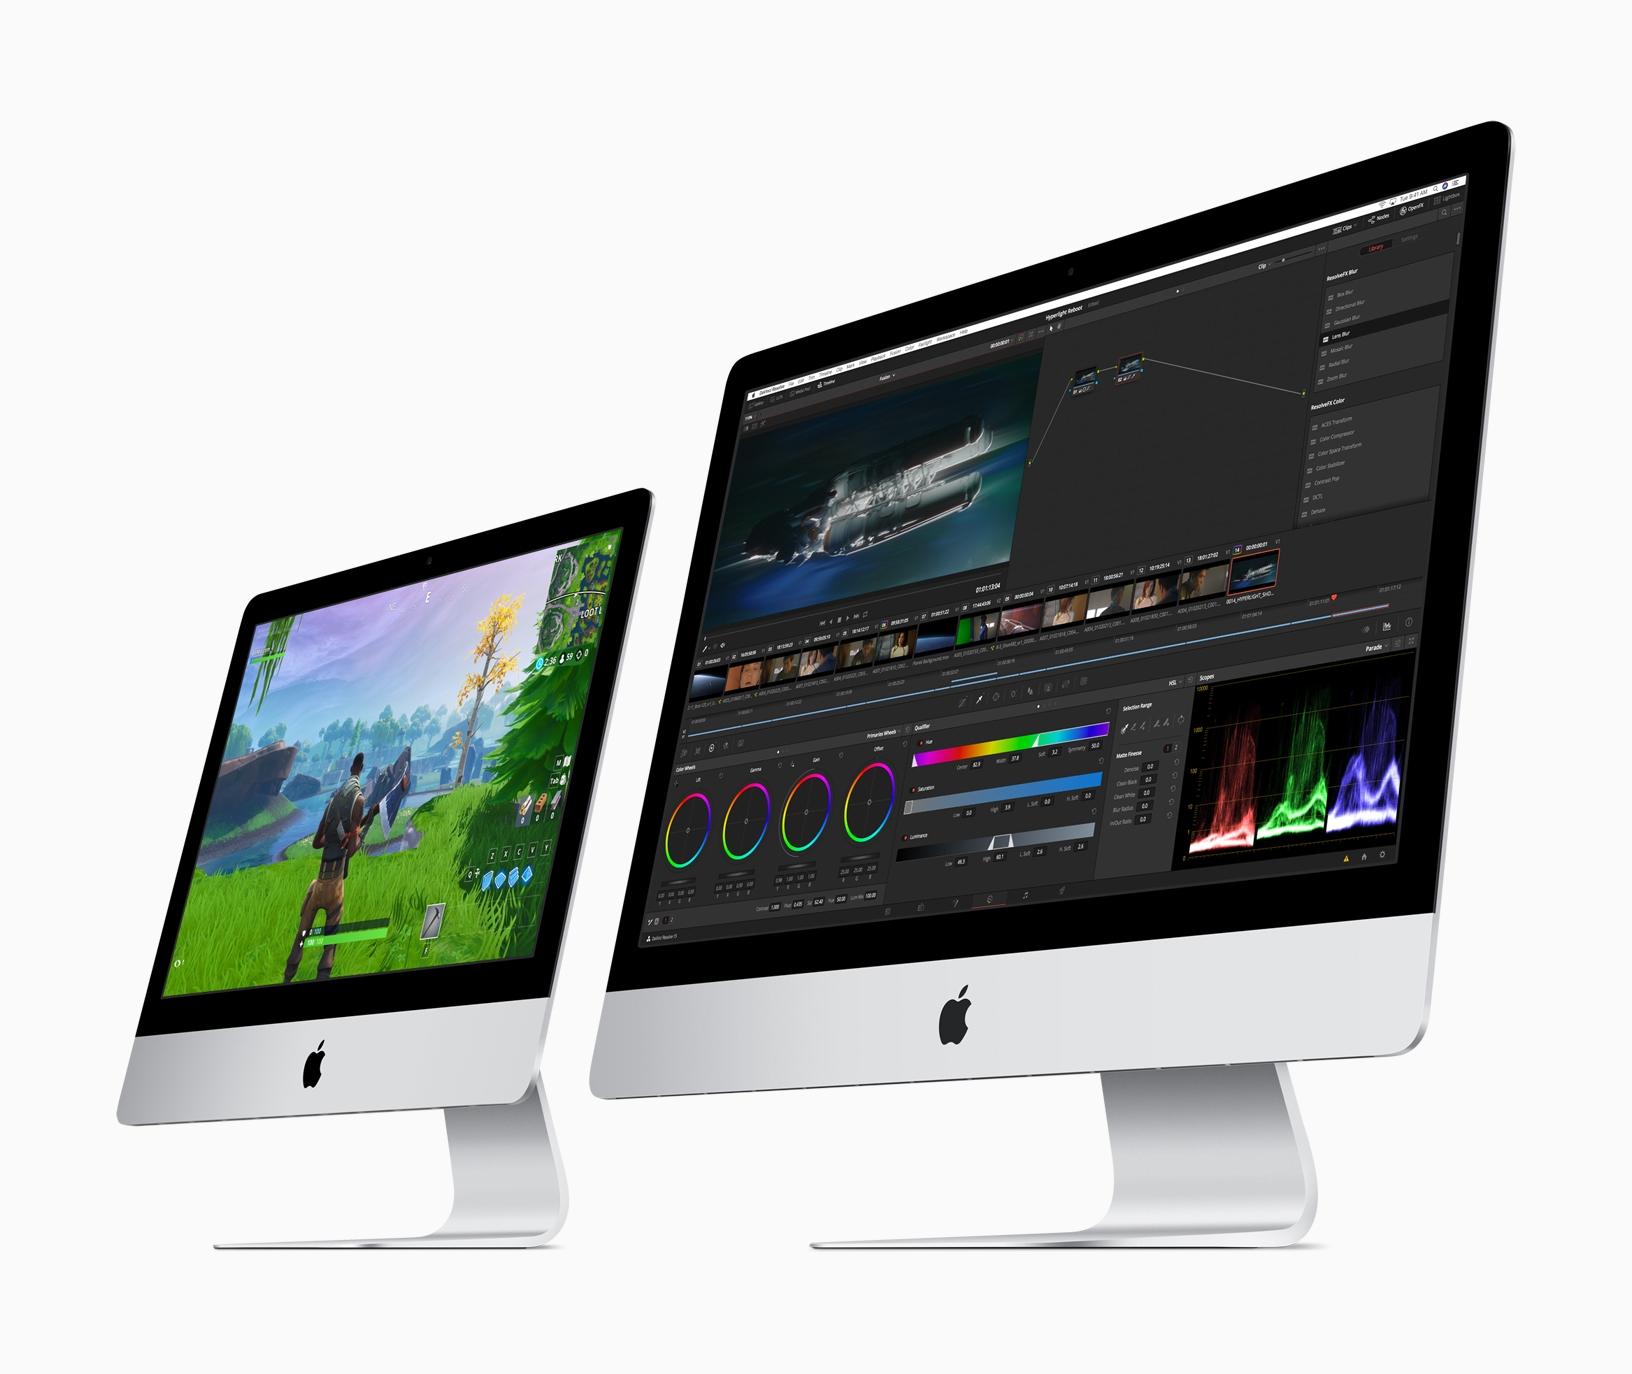 Apple iMac gets 2x more performance 21in and 27in 03192019 - Apple aktualizoval iMac, ponúka Vega grafiky a najnovšie Intel procesory